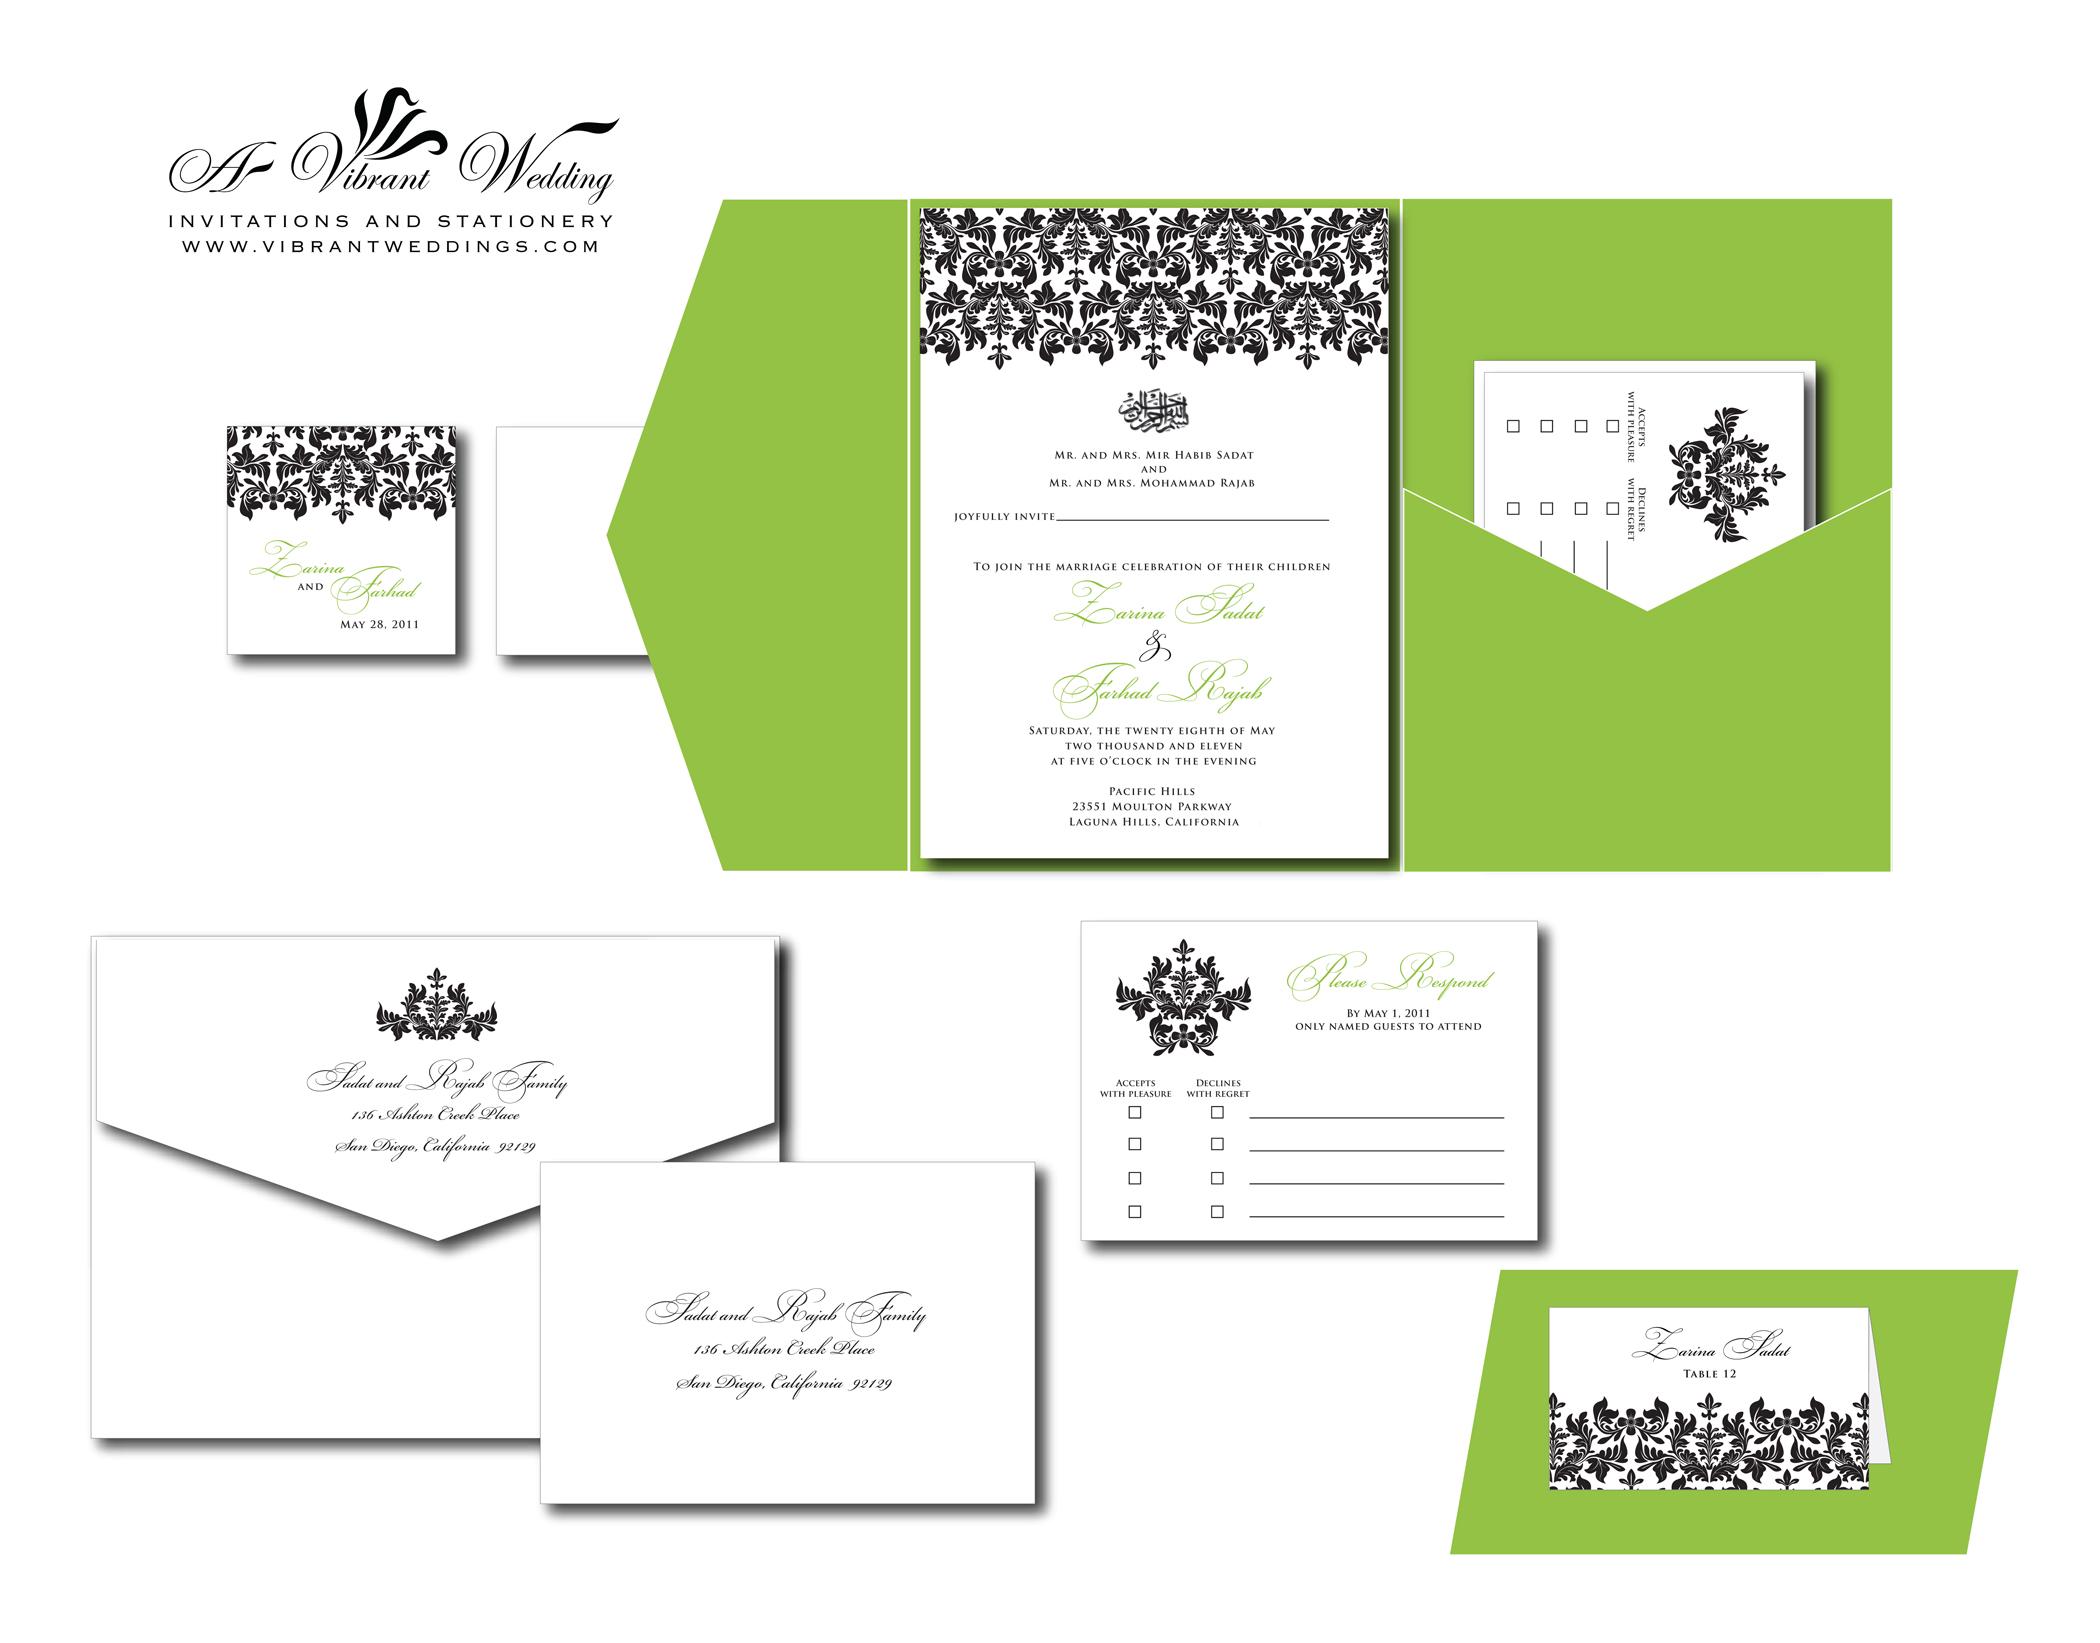 damask wedding invitation damask wedding invitations Green with Black Damask Wedding Invitation